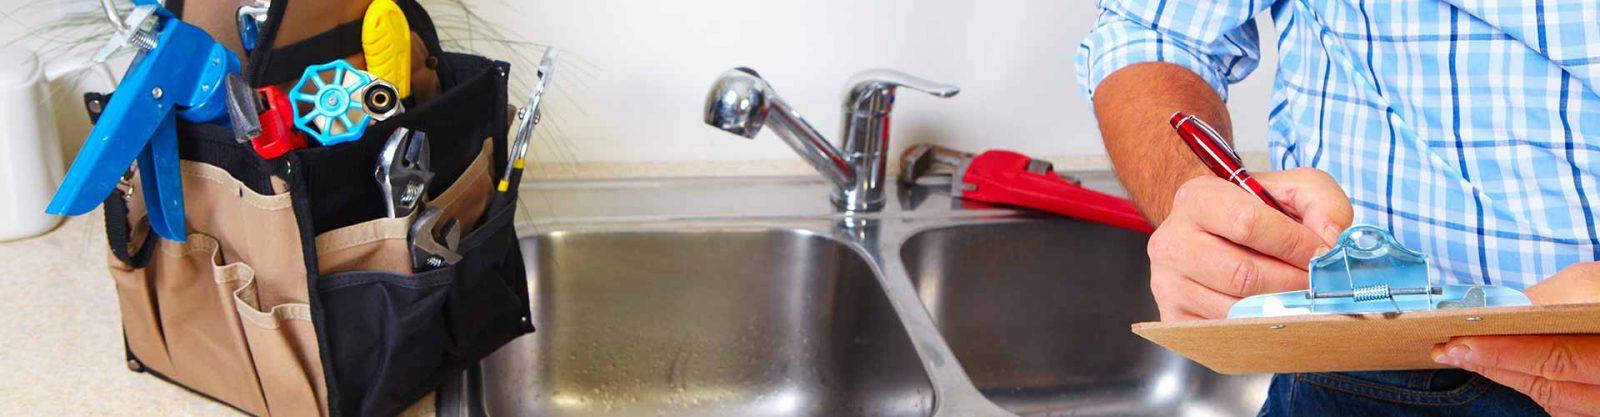 residential plumbing services sunshine coast